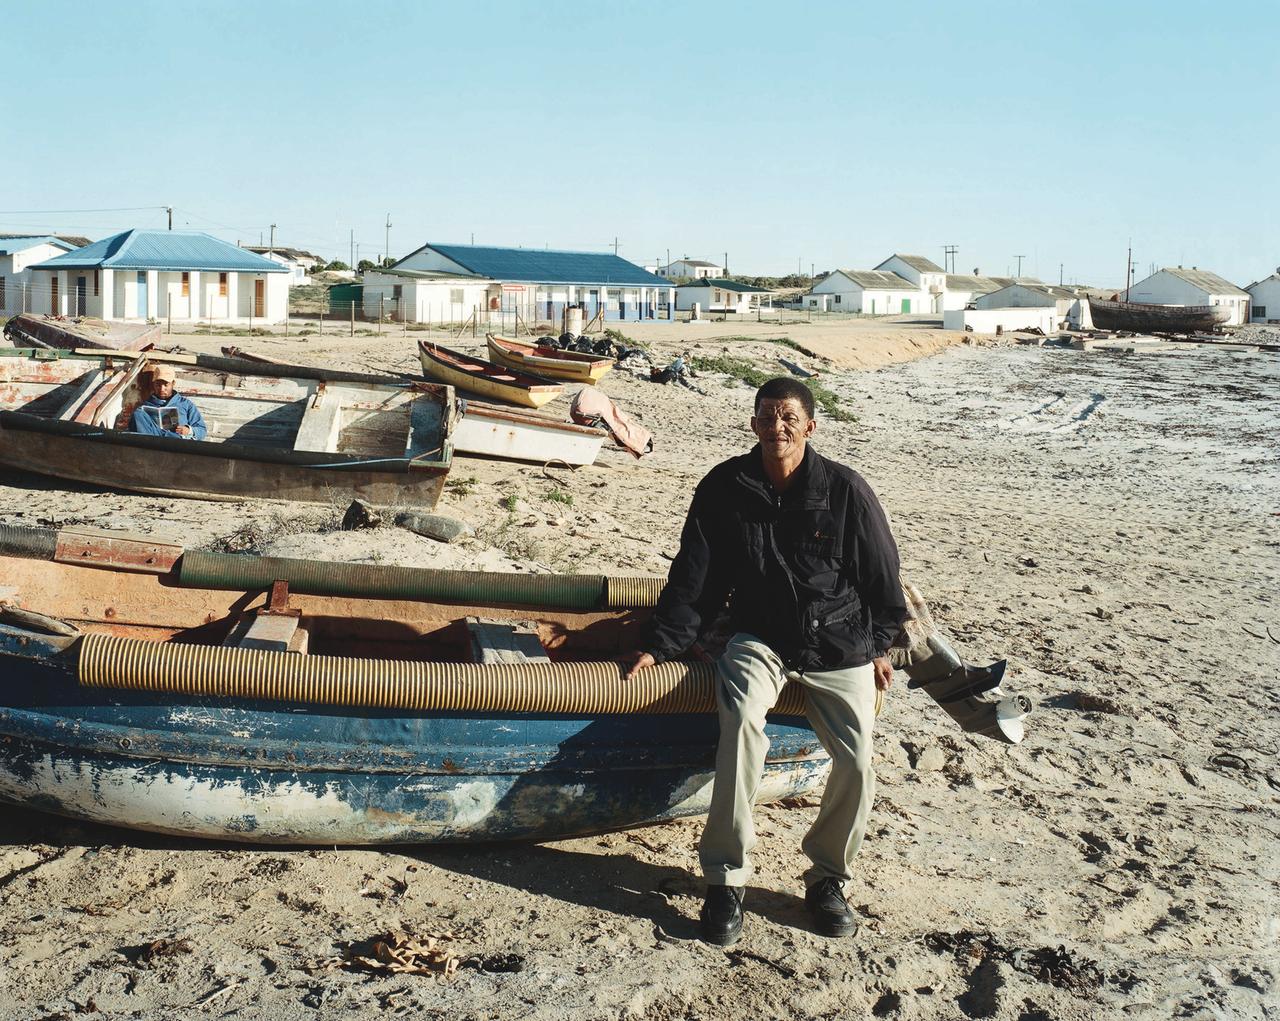 Piet Sochop, Municipal Councilor, Houdeklipbaai, Northern Cape, June 28, 2004 ((c) 2014 David Goldblatt)